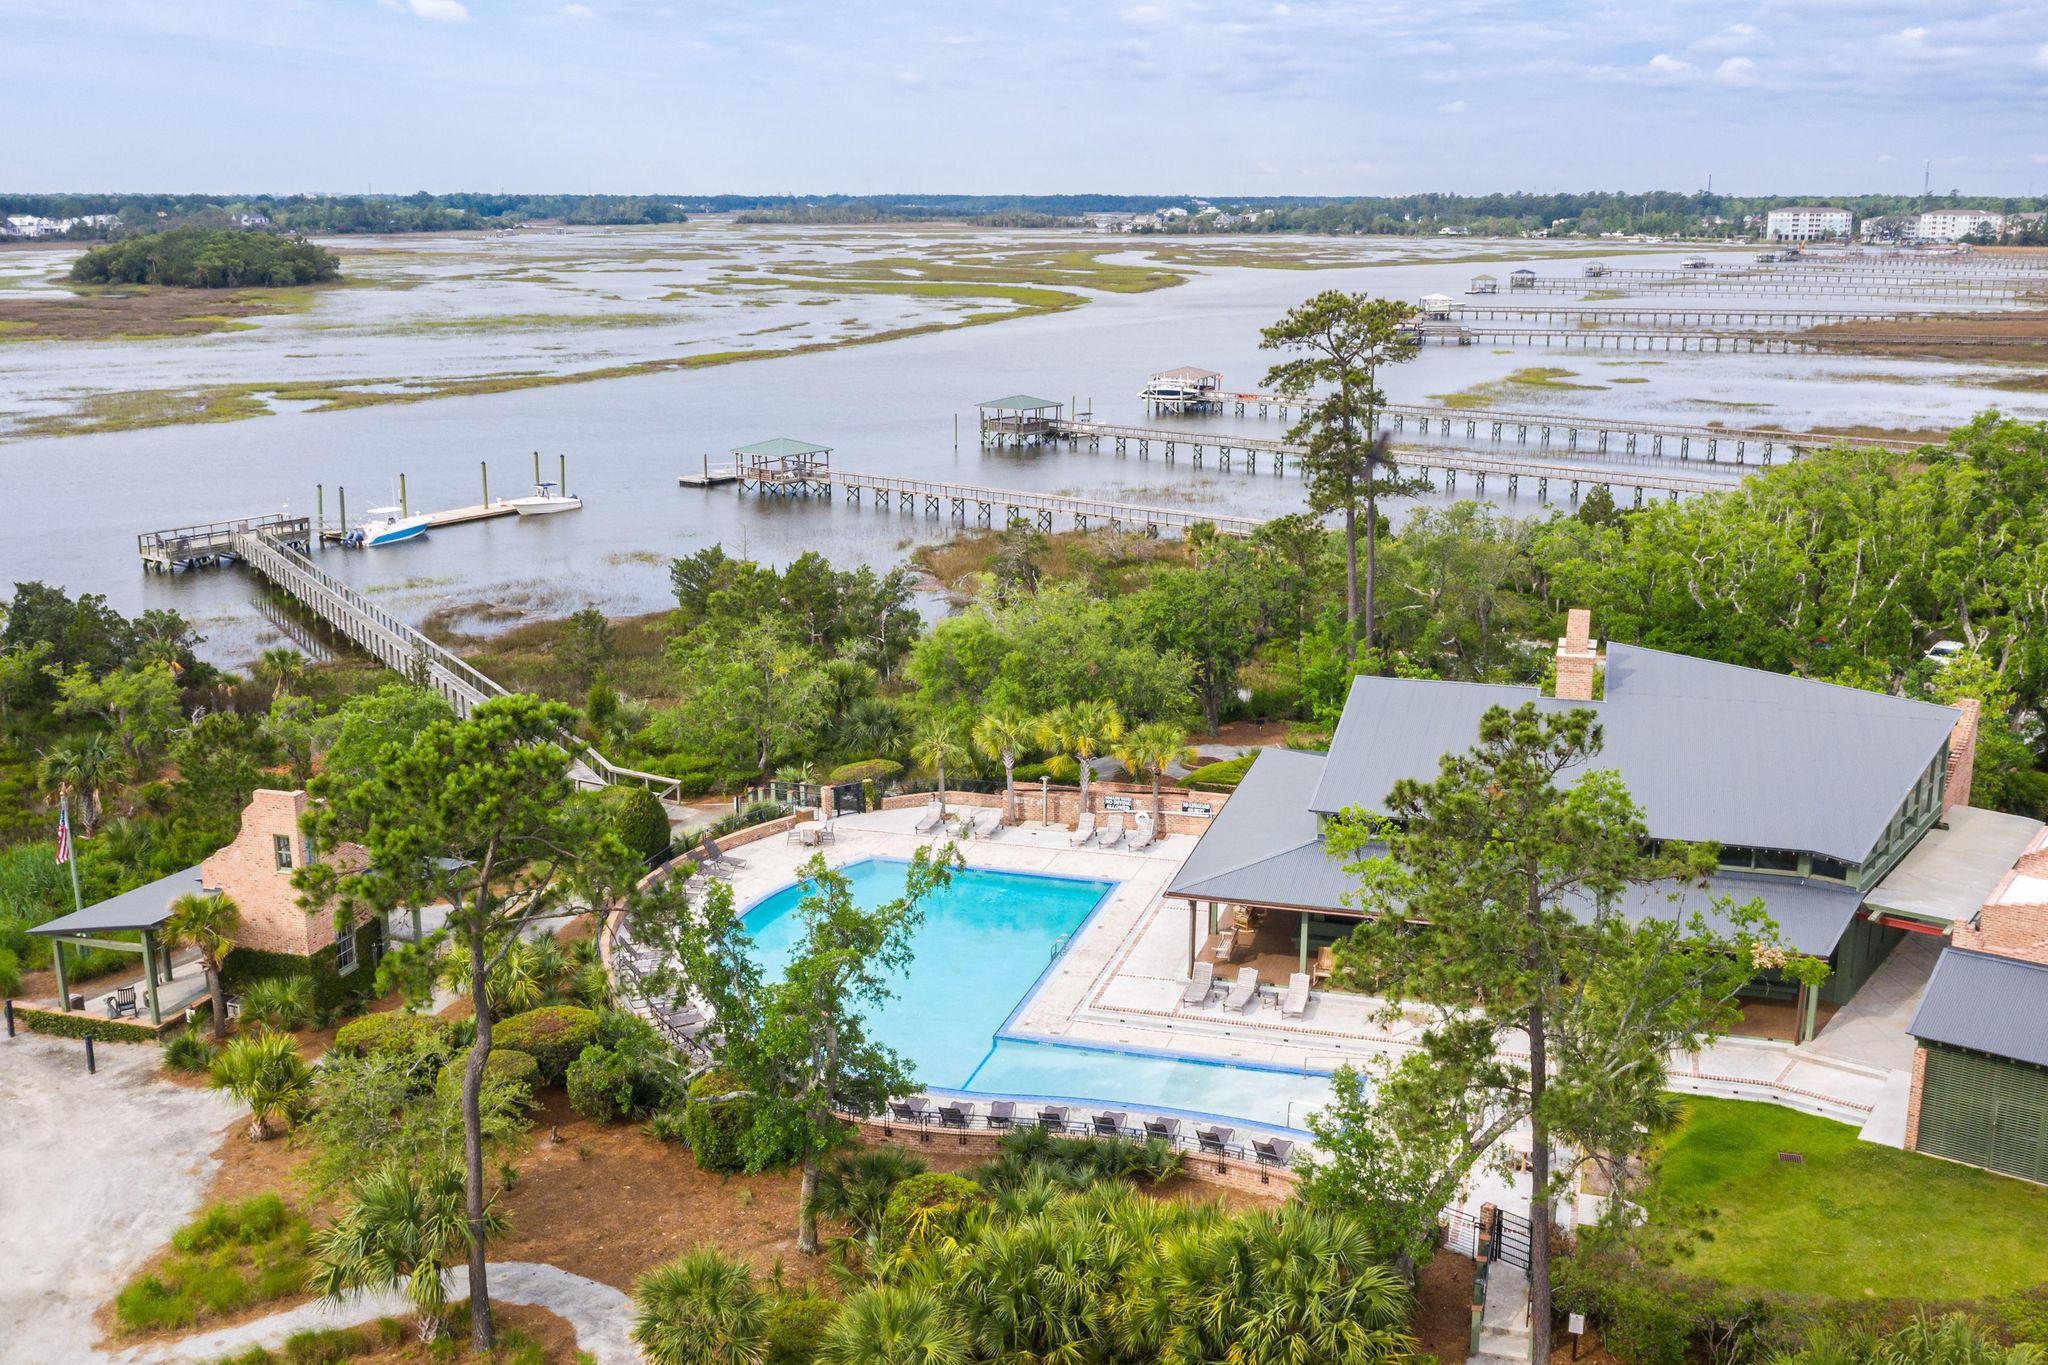 Beresford Hall Homes For Sale - 230 Grand Park, Charleston, SC - 6